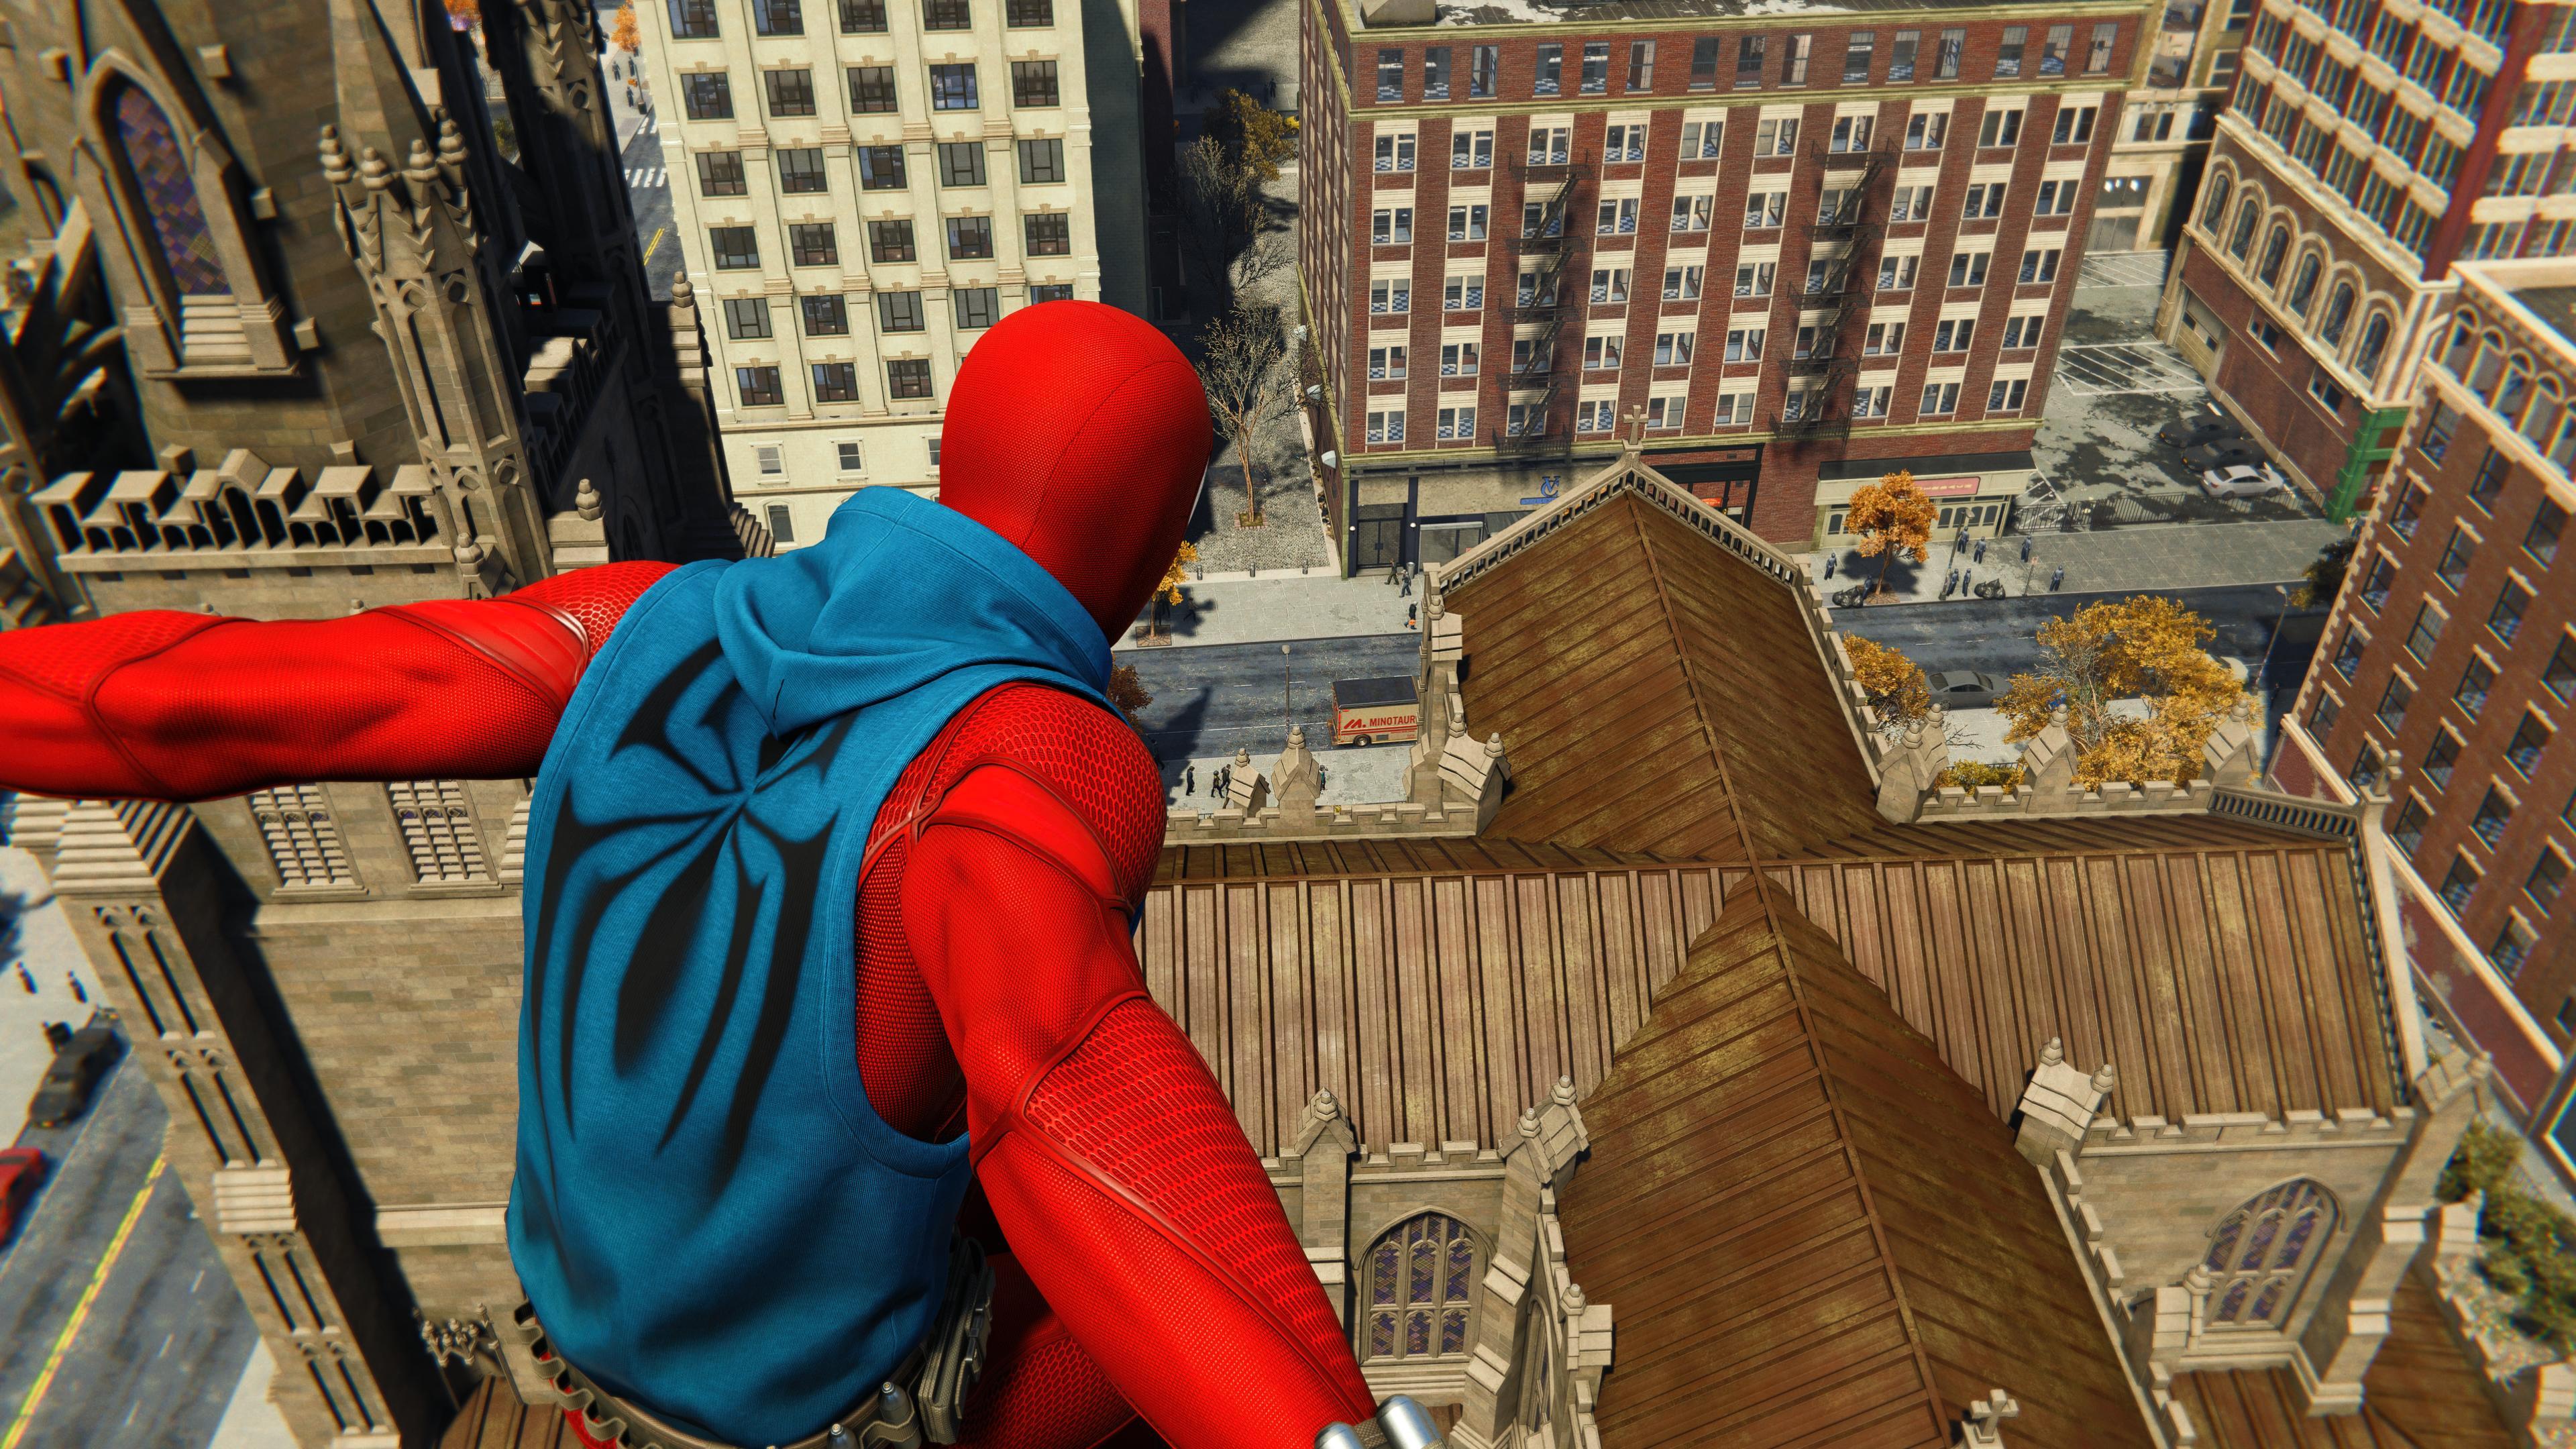 https://i.ibb.co/PtmVdry/Marvel-s-Spider-Man-Remastered-20210511233733.jpg